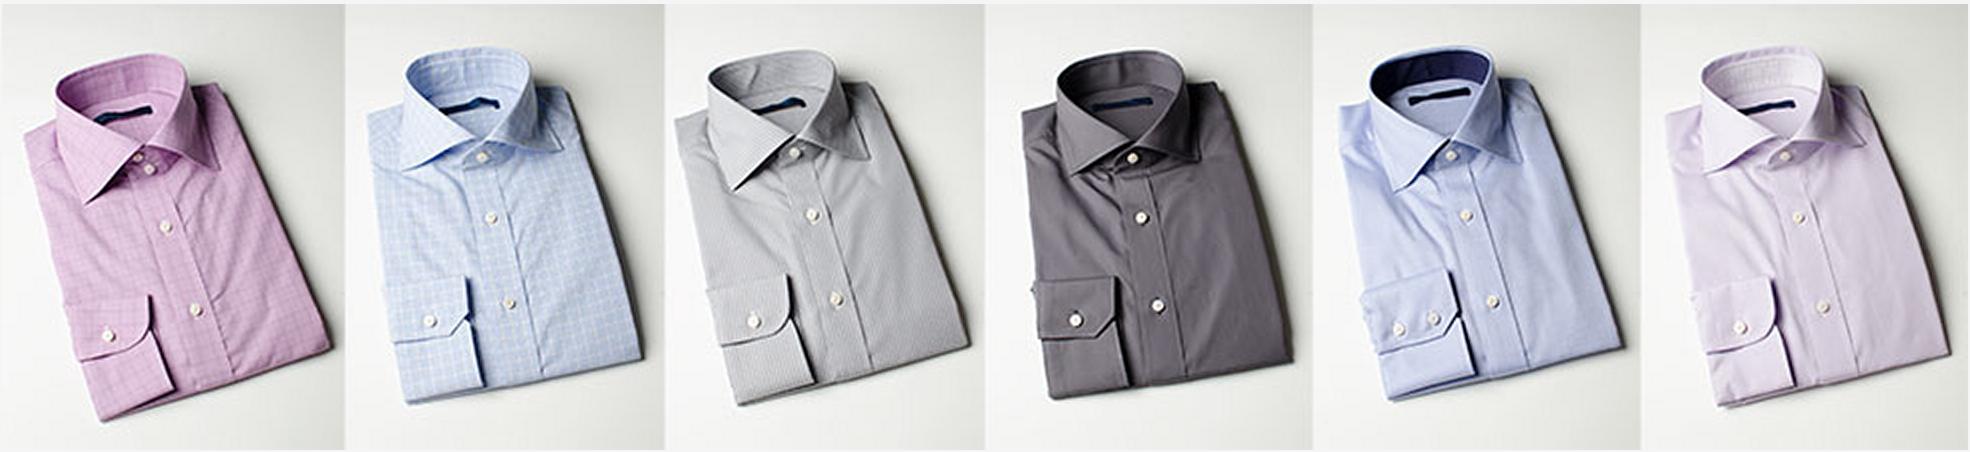 hm-shirts2